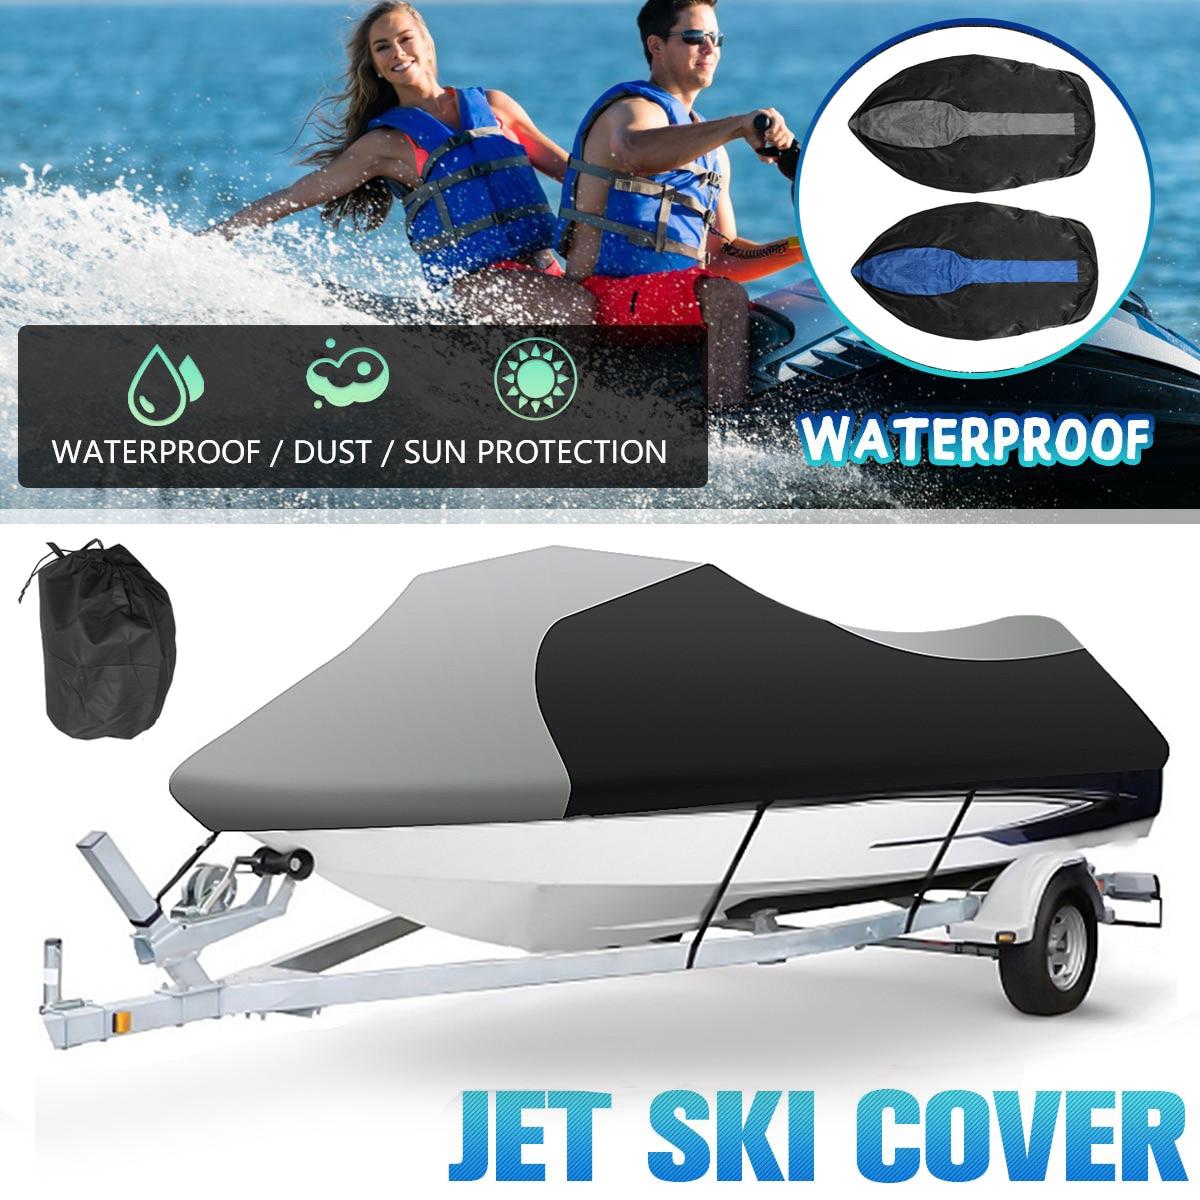 210DWaterproof Dustproof Sunscreen Jet Ski Watercraft Boat Cover Protector For Yamaha WaveRunner EXR Sea Doo